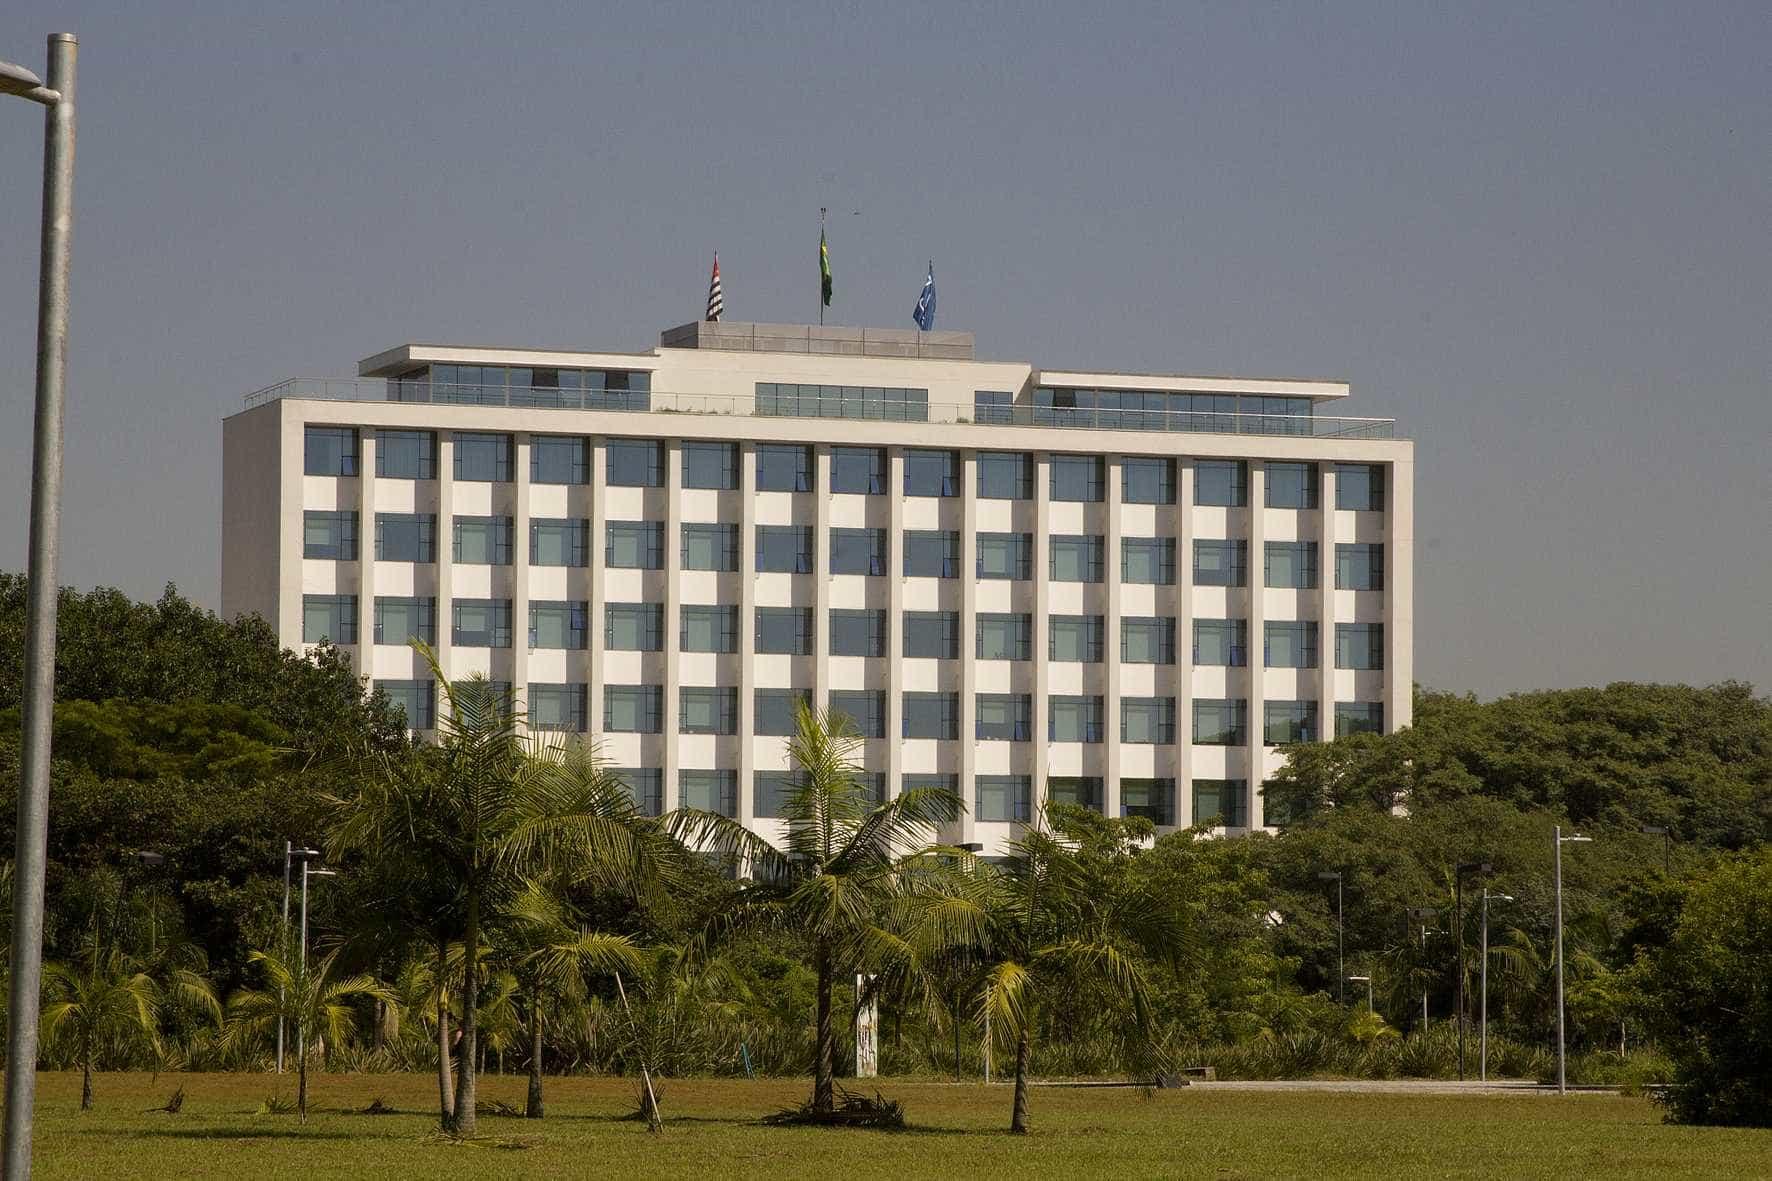 USP volta atrás e confirma matrícula de alunos de colégios militares